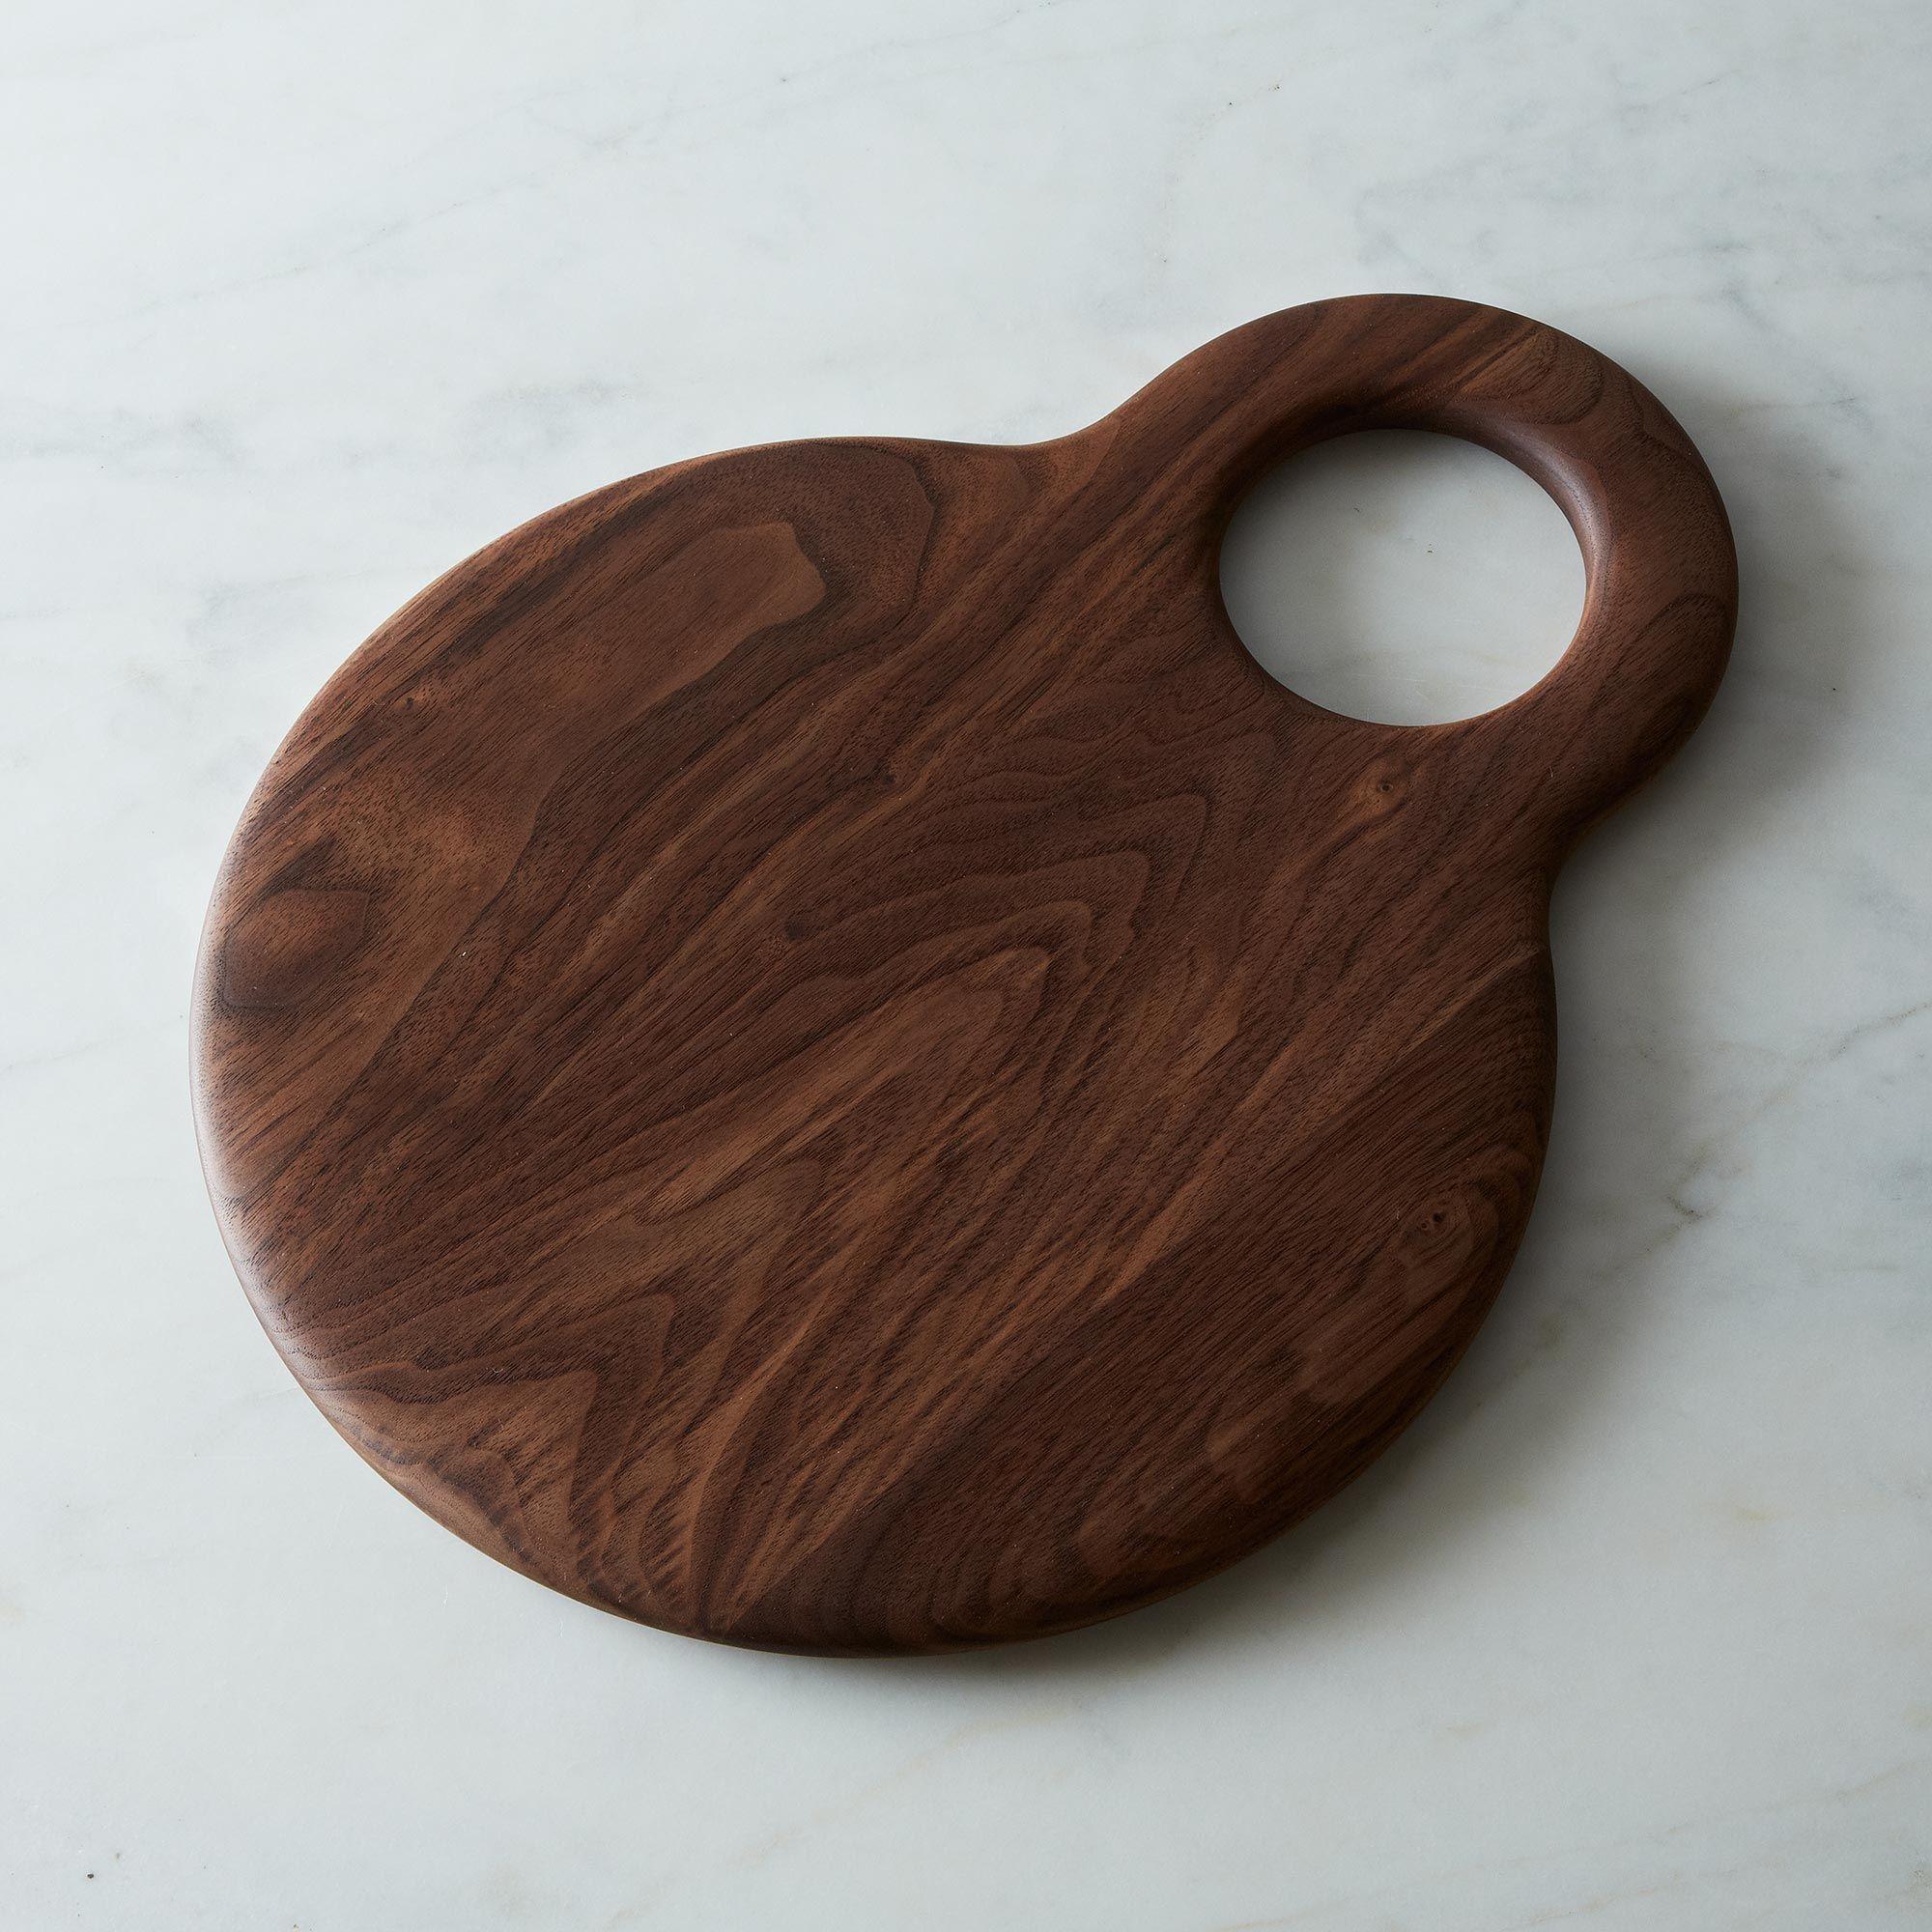 1ee834ab 888f 4ca0 9162 e16582e40cad  2013 1030 on our table hold slab pico serving board walnut 009